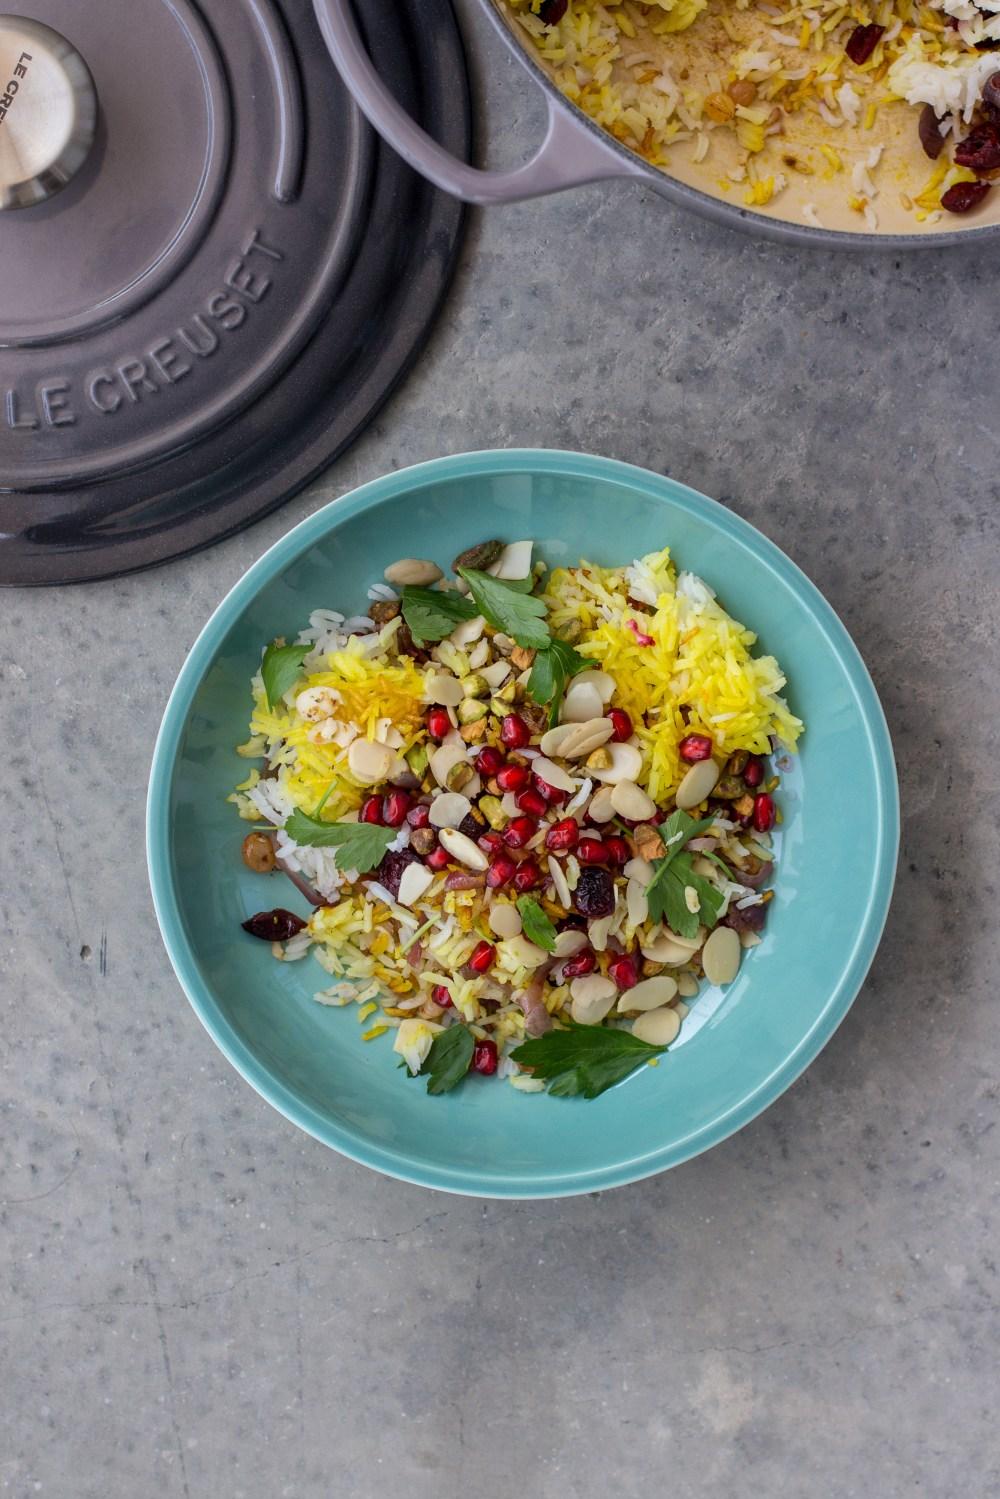 Jewelled Saffron Rice in Sage Le Creuset Coupe Pasta Bowl